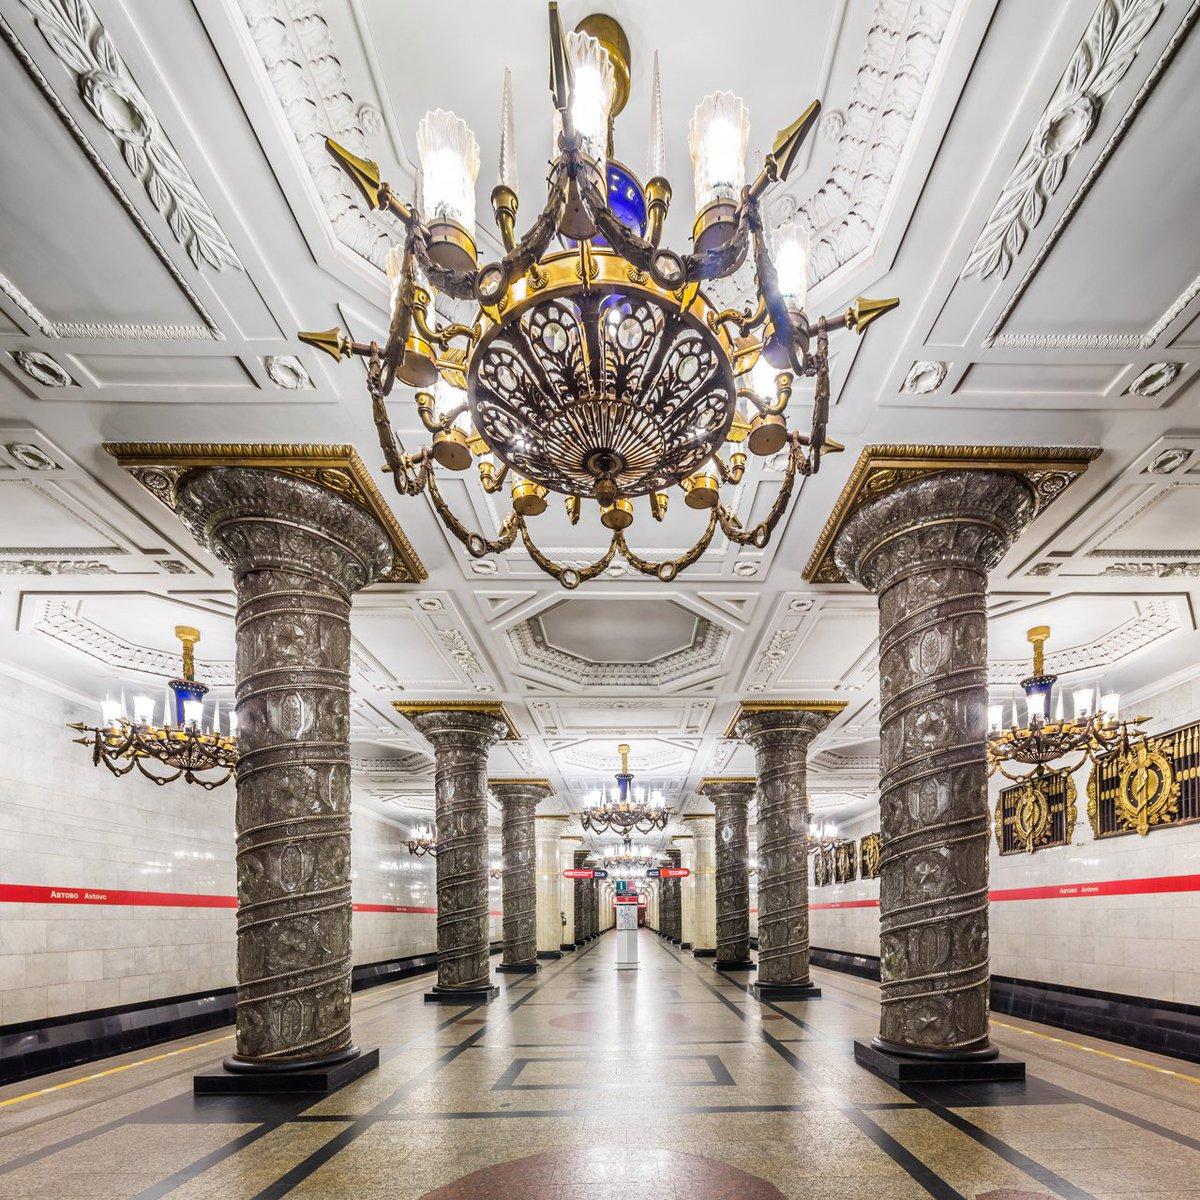 вариантов станции метро в санкт петербурге фото диета